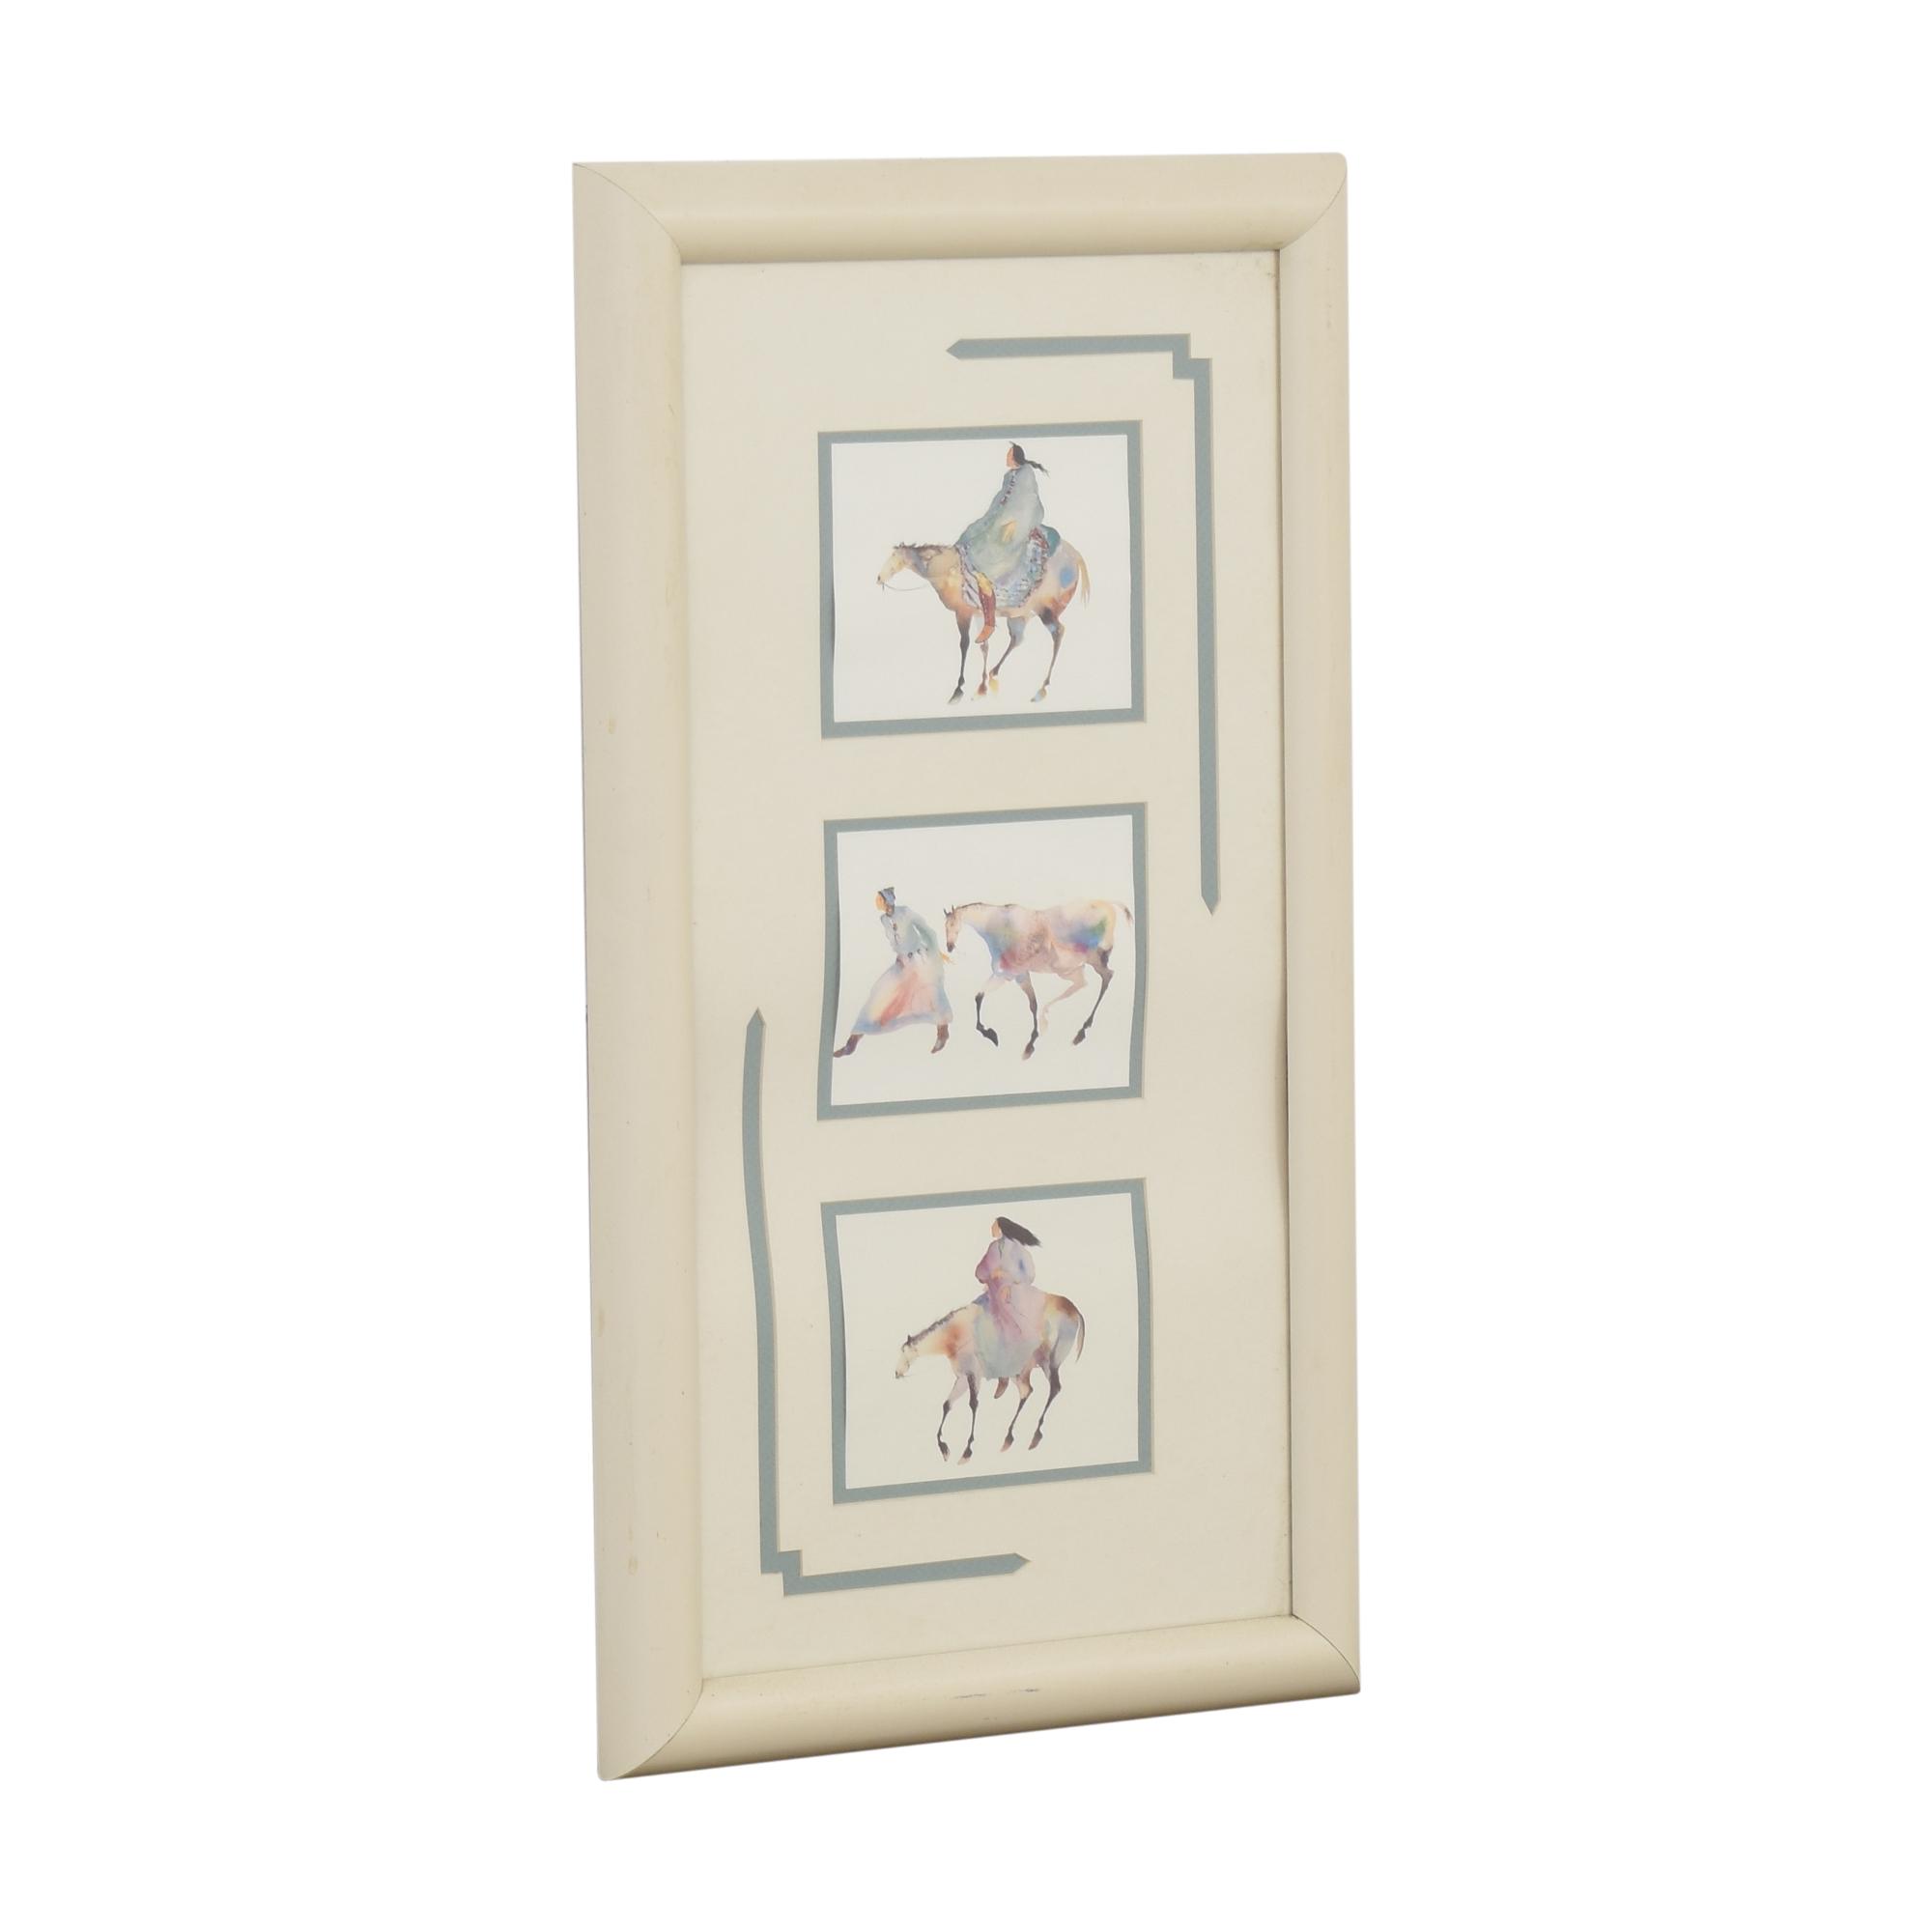 Framed Equestrian Wall Art sale